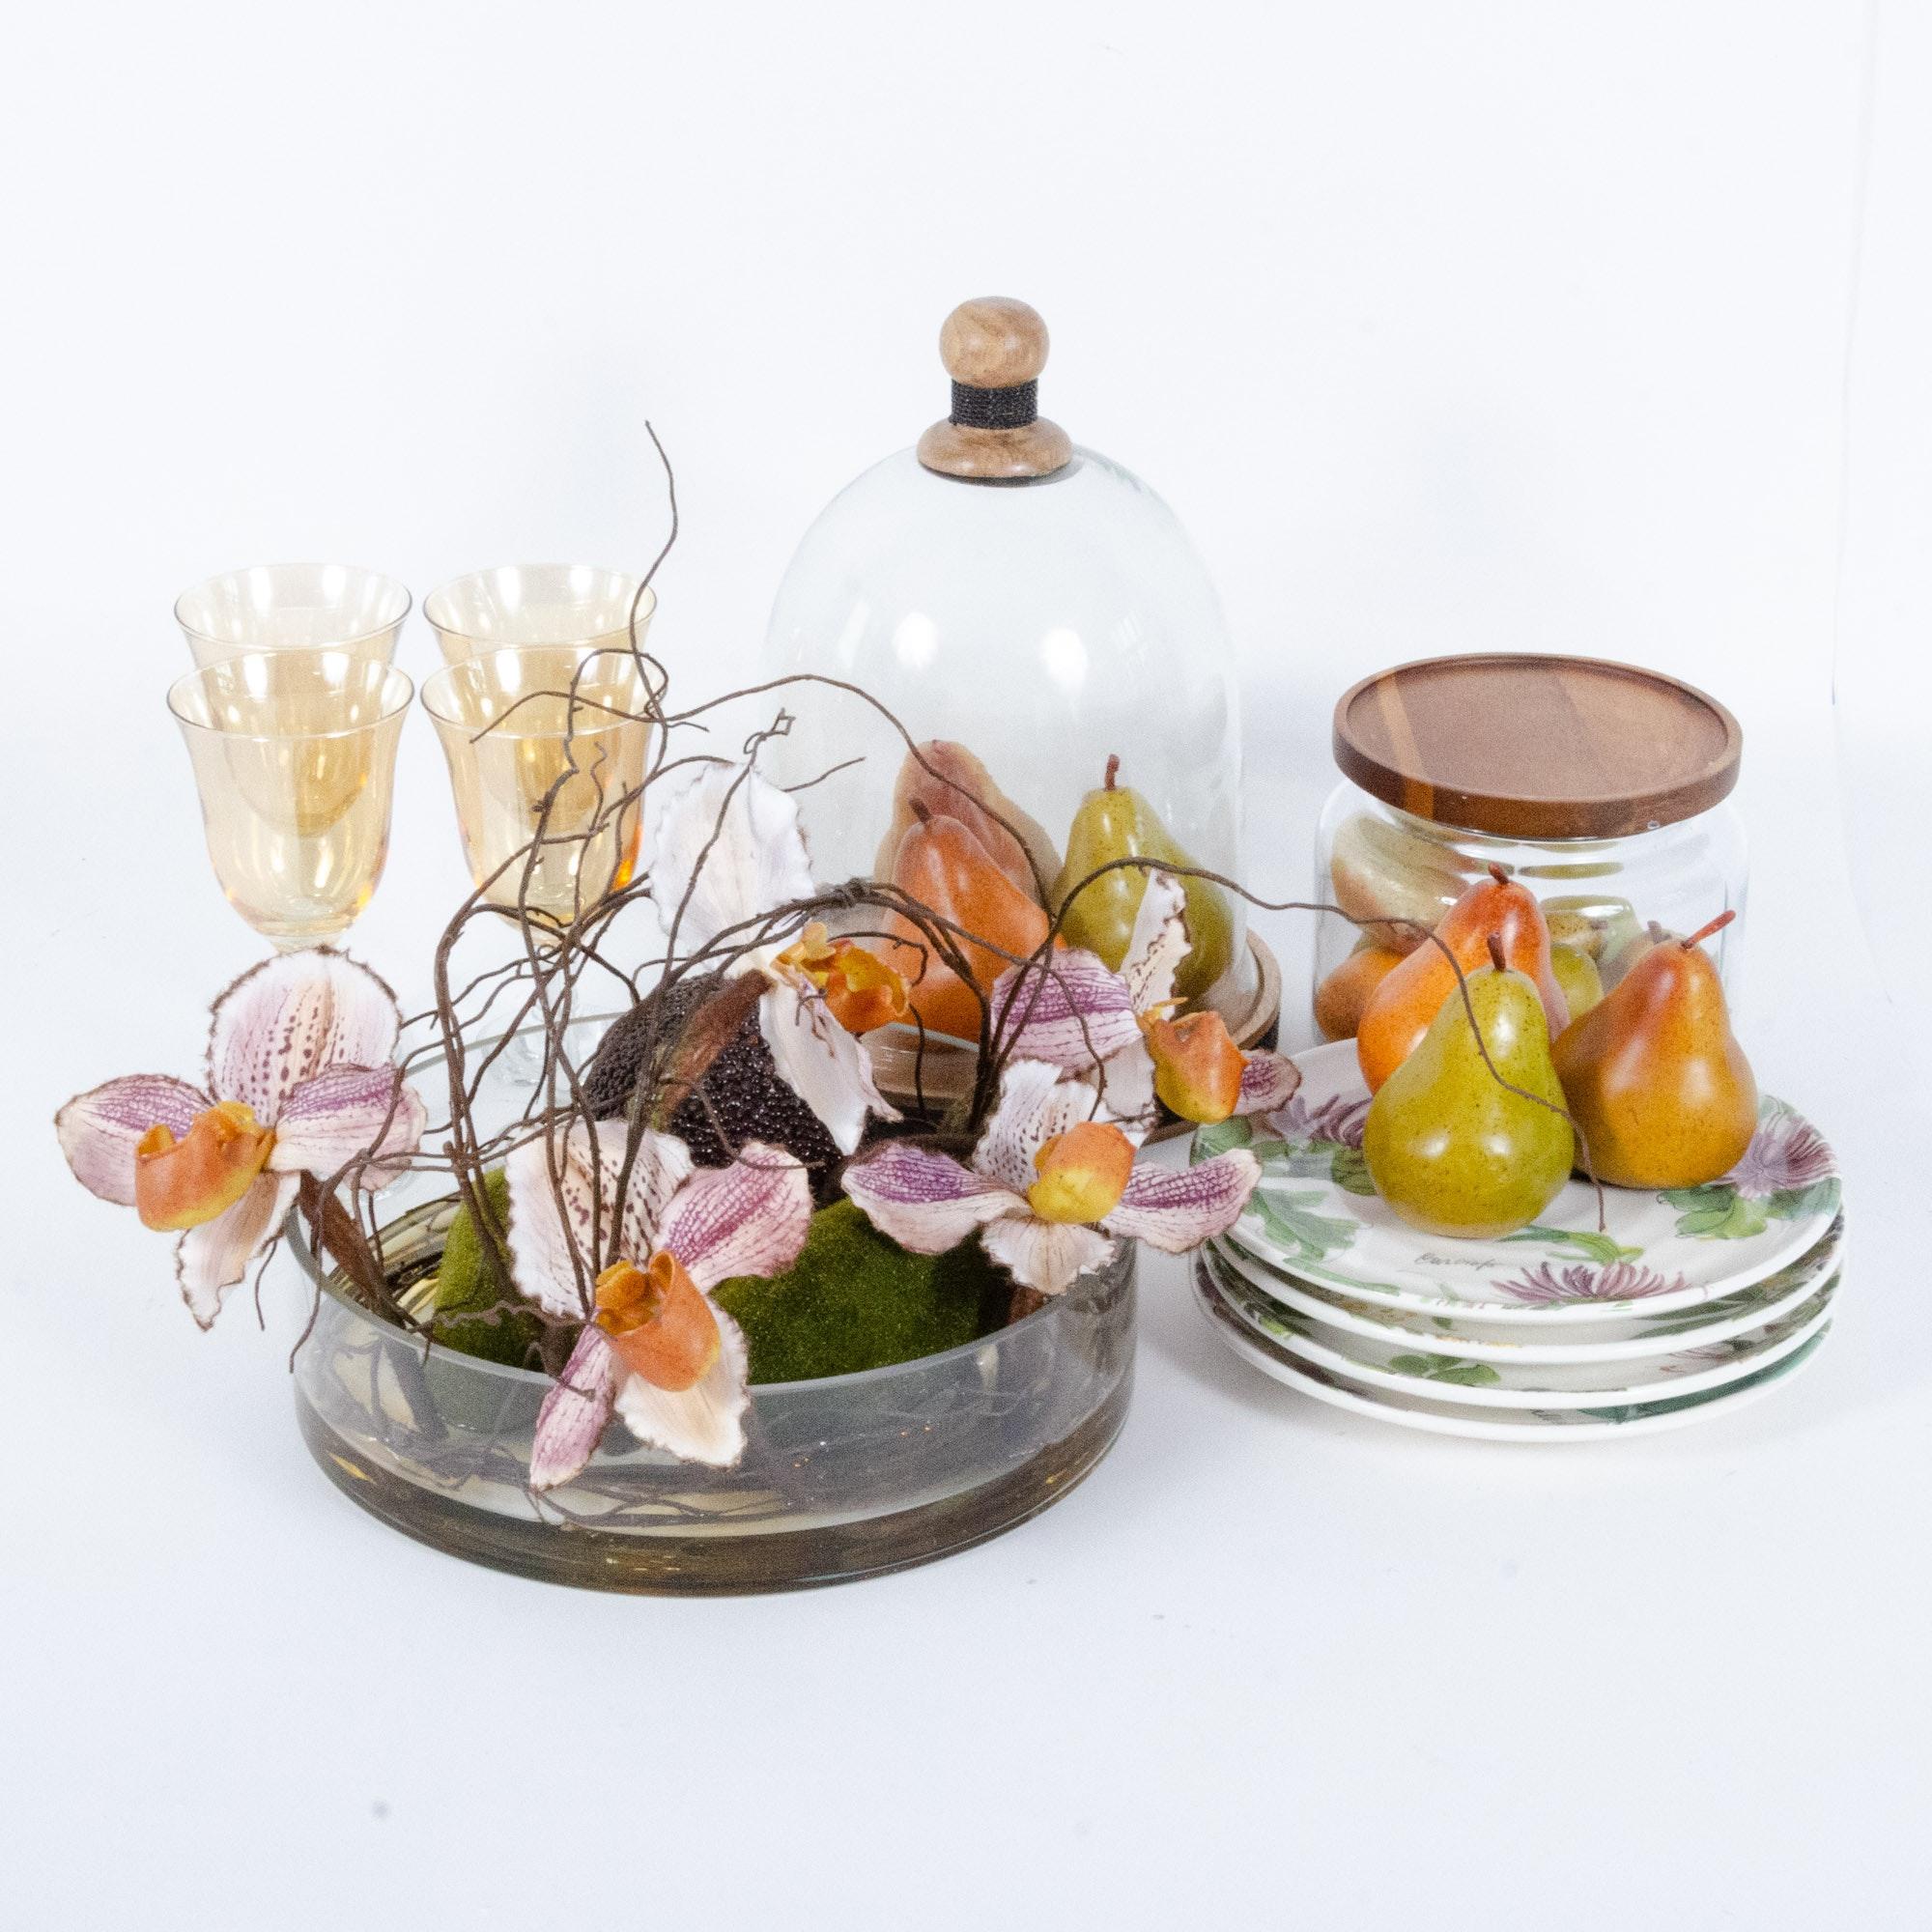 Dining Centerpieces, Stemware and Decor